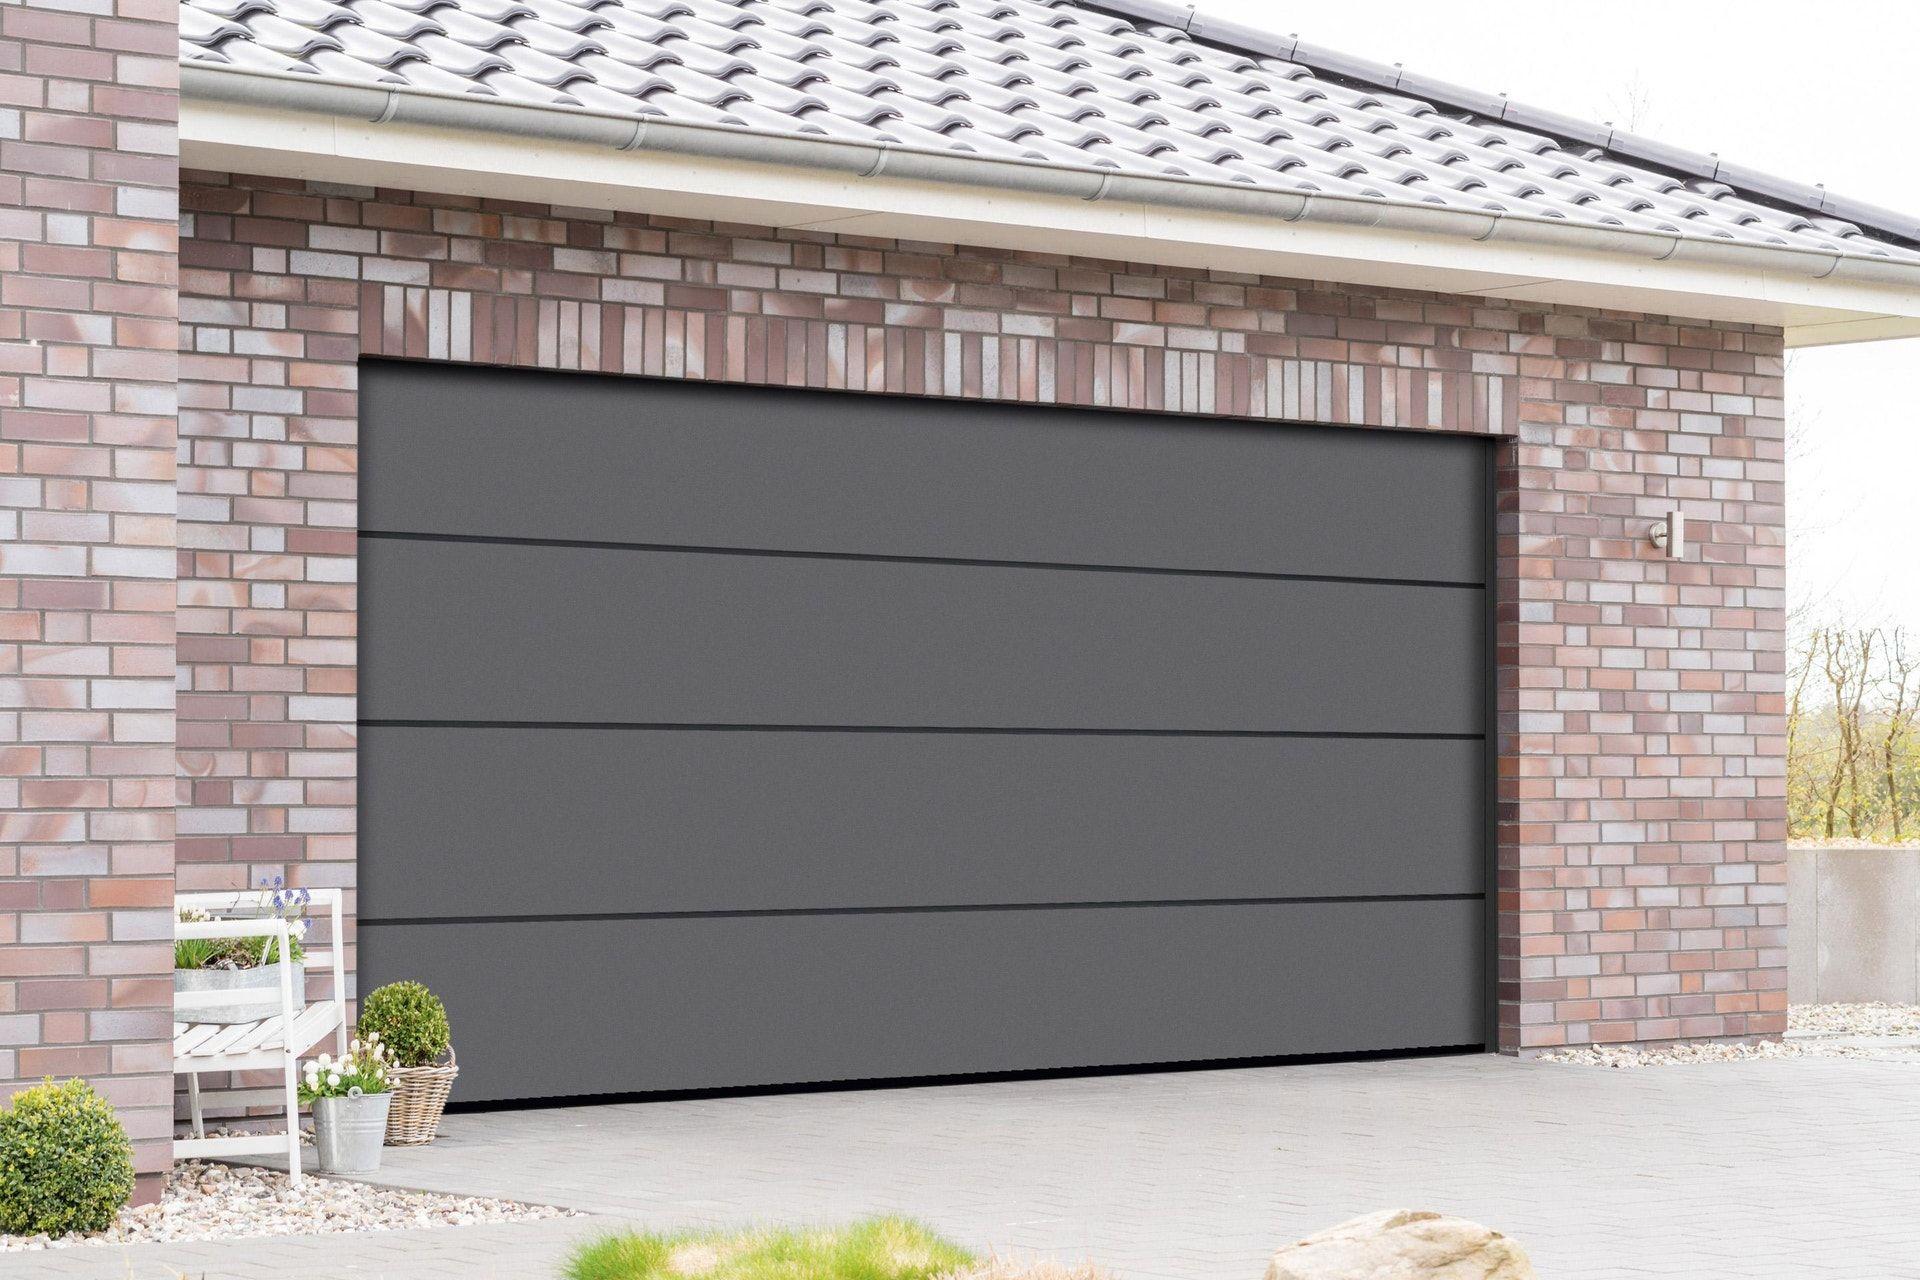 Porte De Garage Sectionnelle Motorisee Artens Premium 212 5x250 Gris En 2020 Porte De Garage Sectionnelle Porte Garage Garage